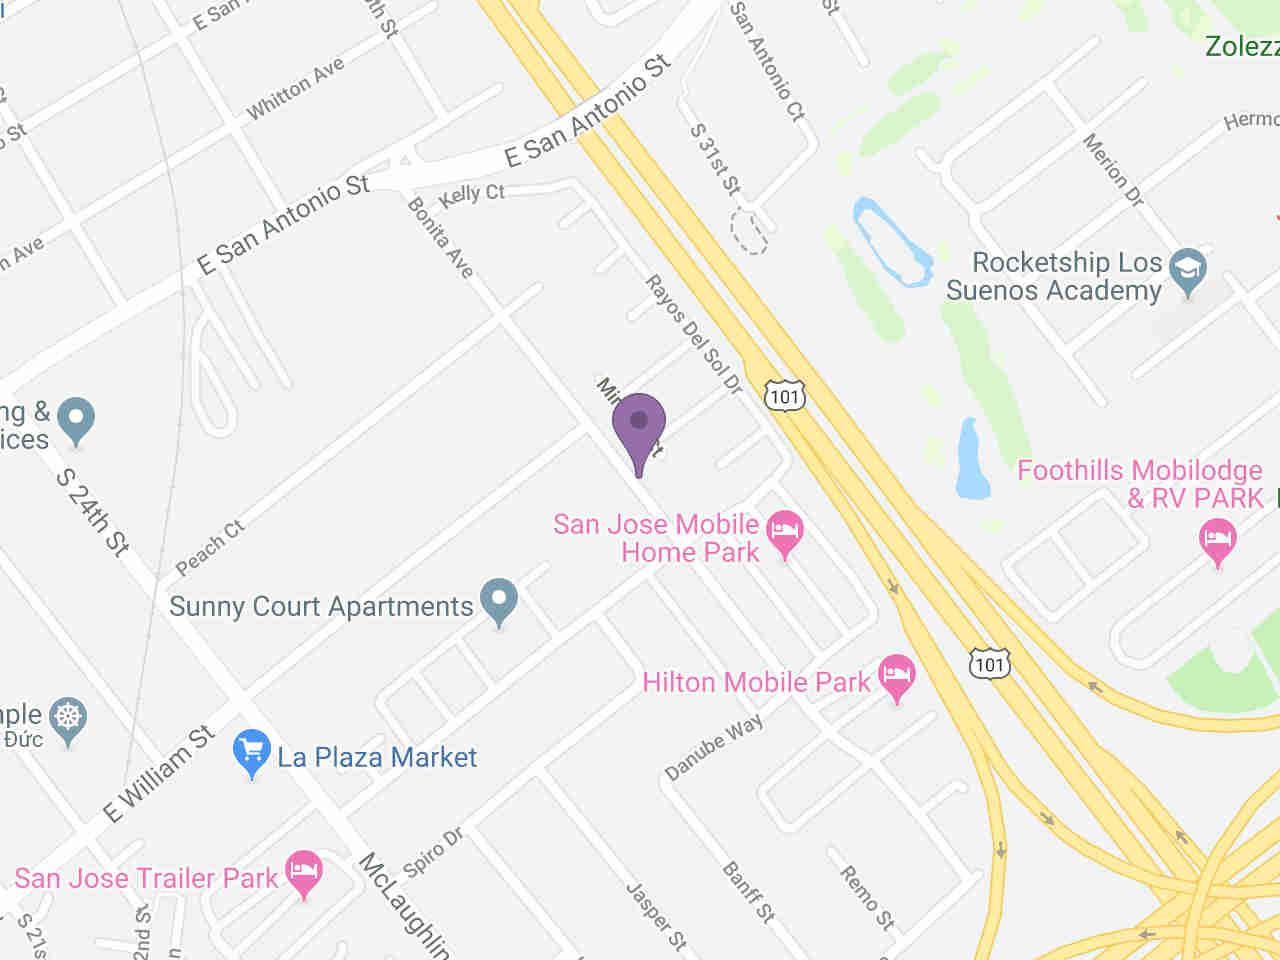 Location:, 425 Bonita AVE San Jose, CA, 95116